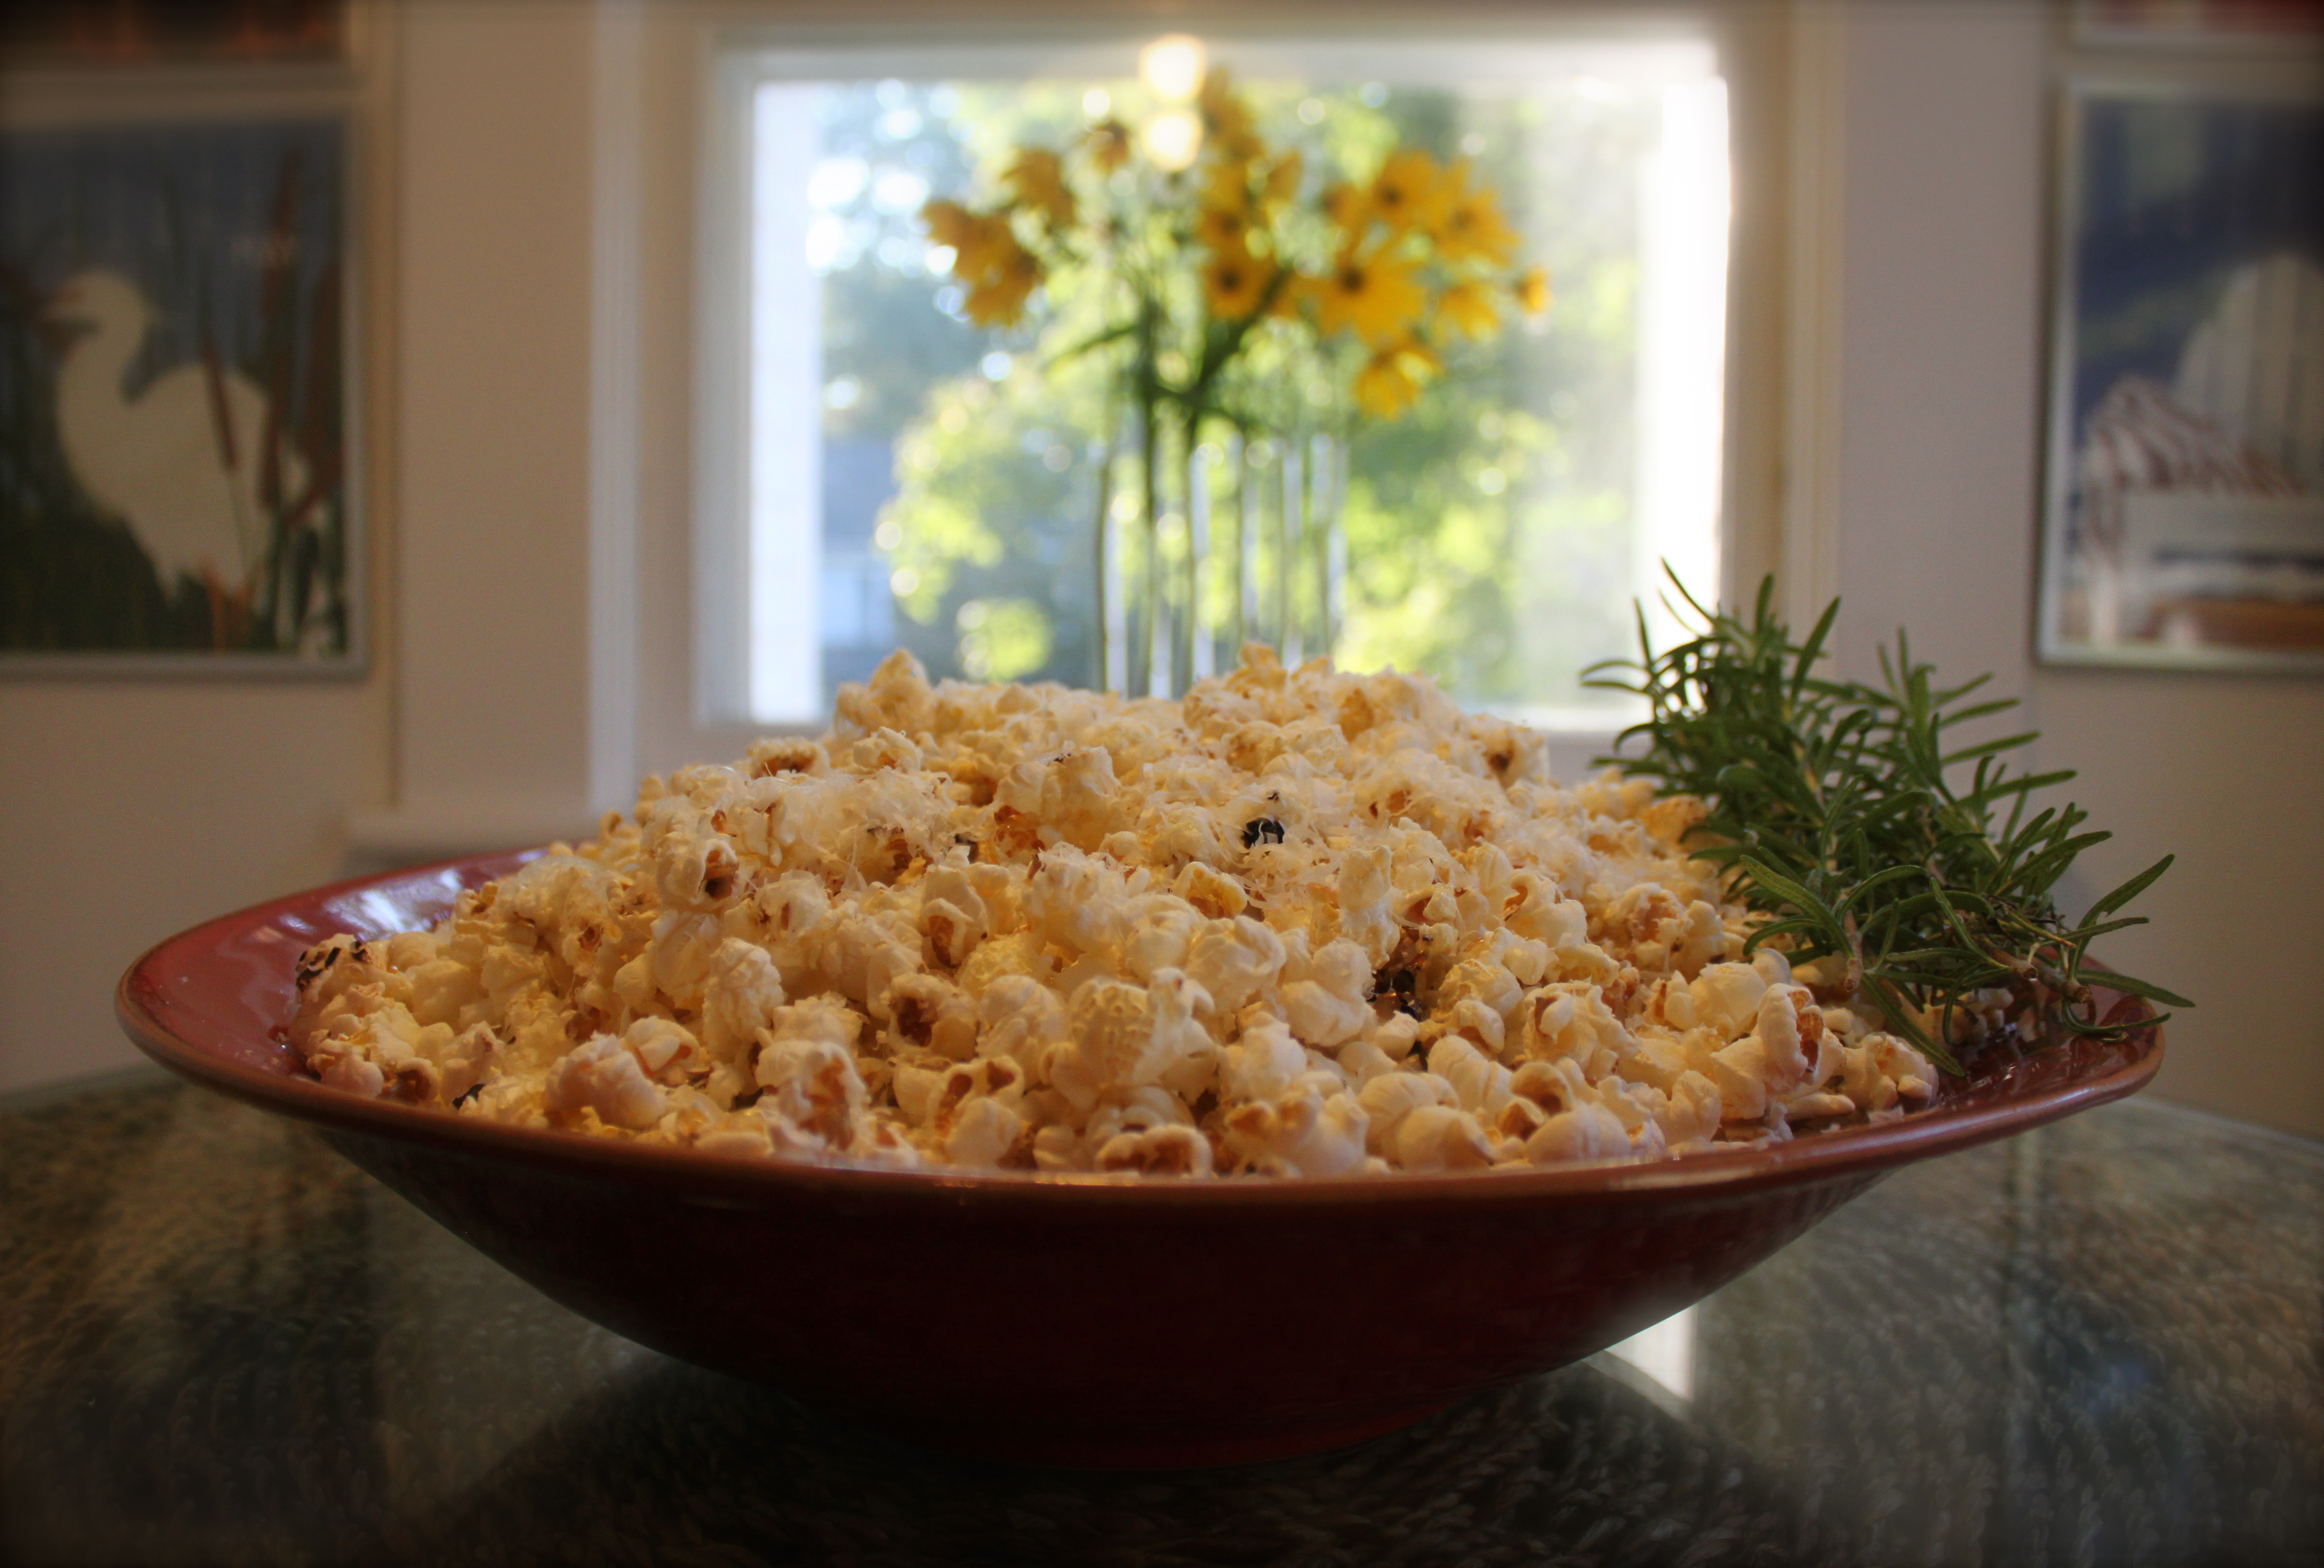 Black Truffle Buttered Popcorn with Dusted Pecorino Romano ...